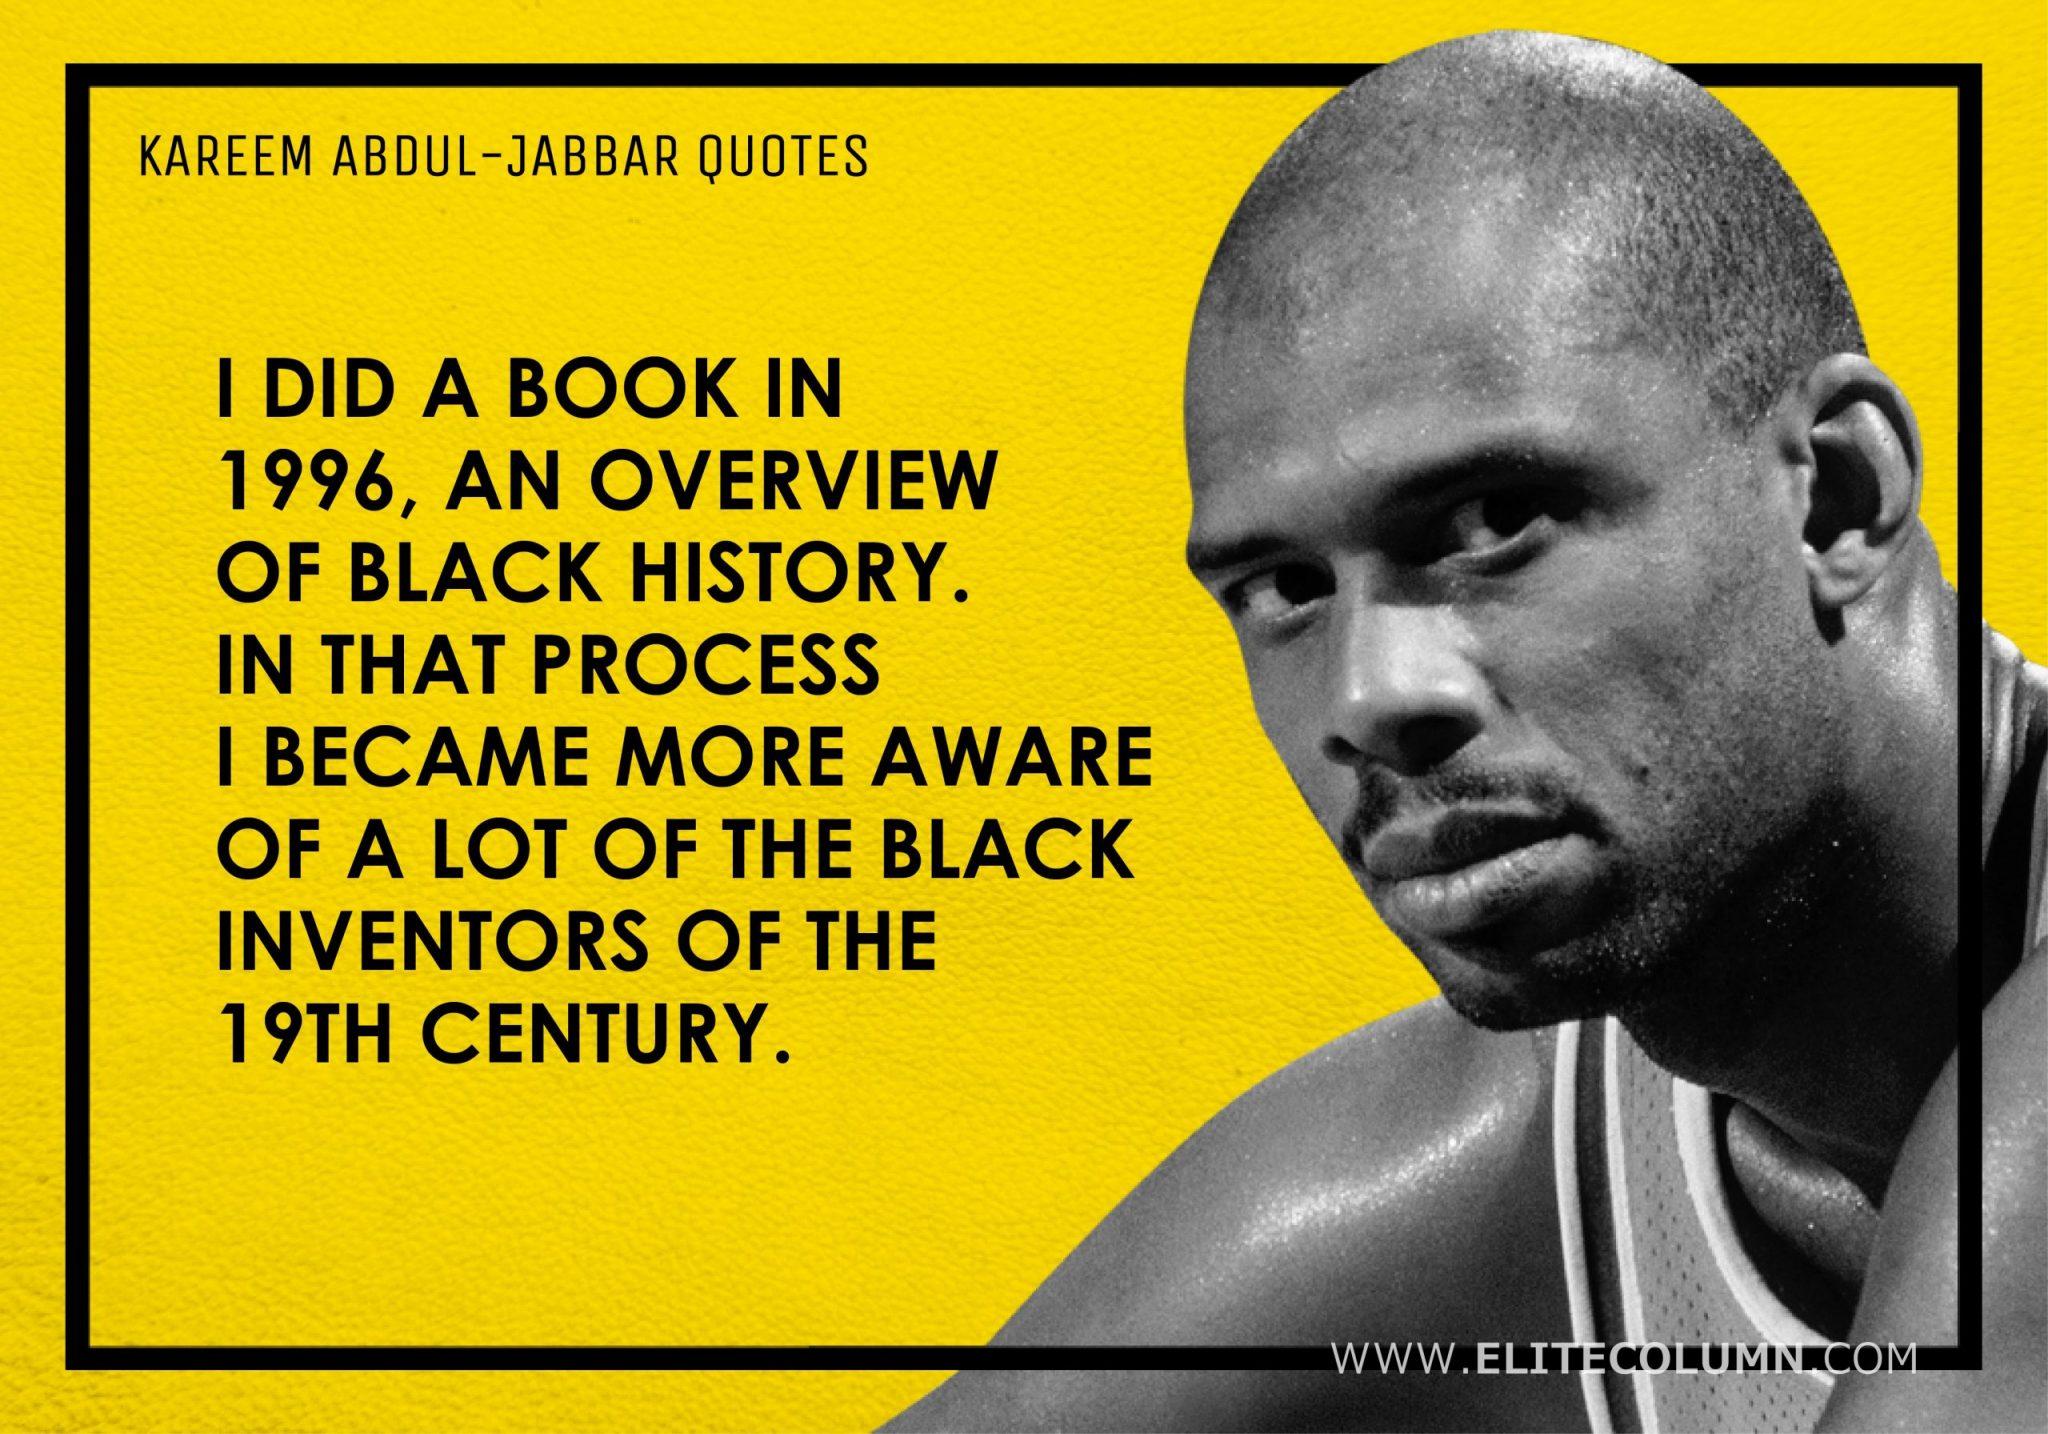 Kareem Abdul-Jabbar Quotes (14)